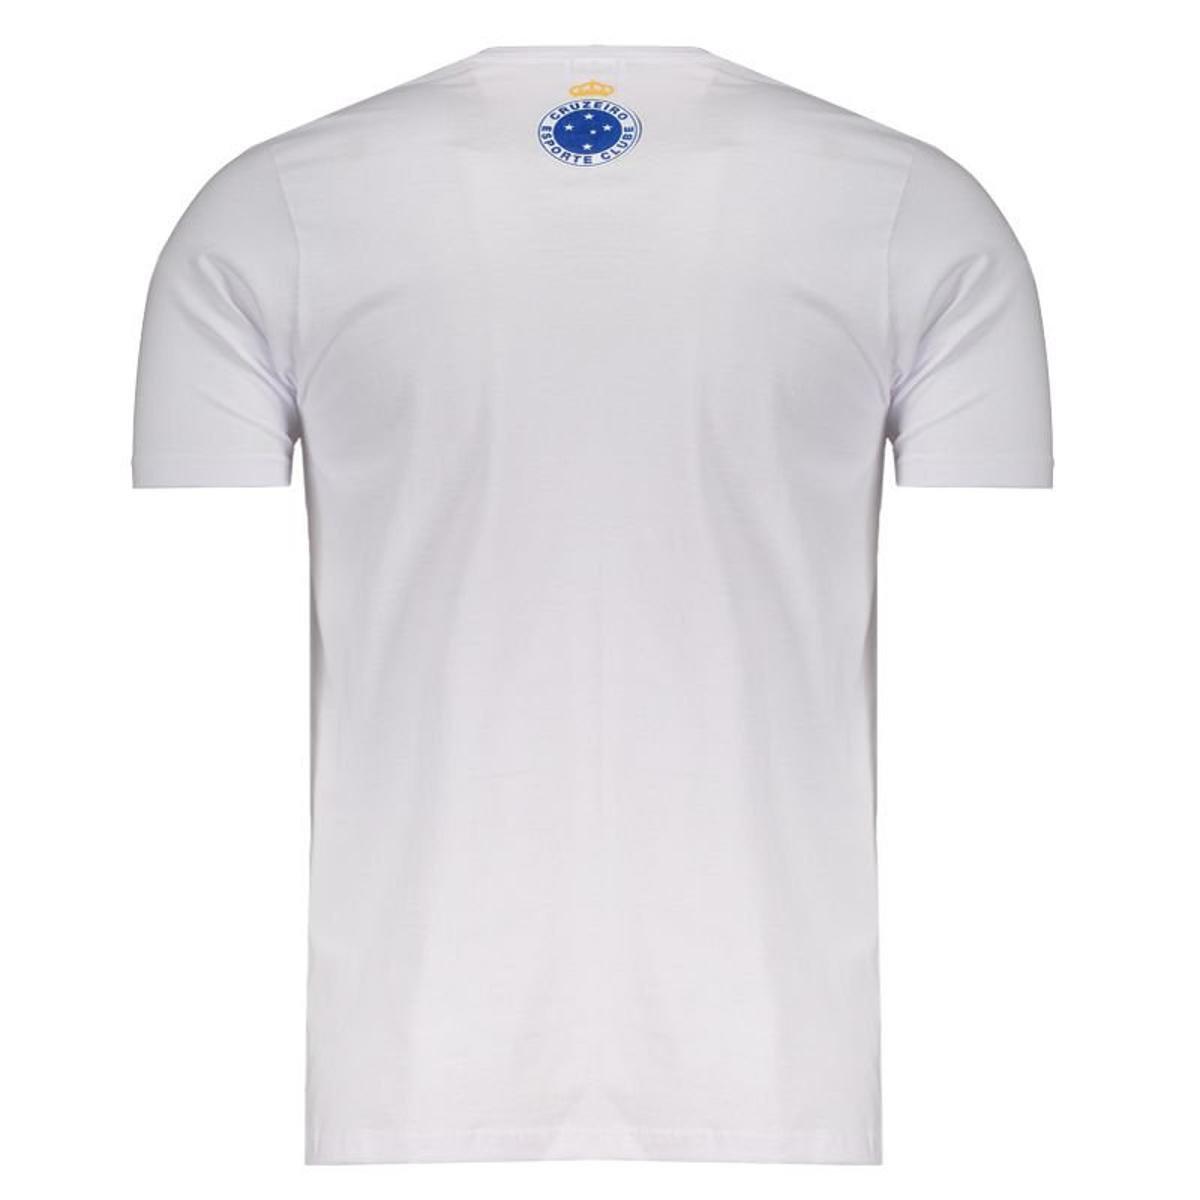 Camiseta Cruzeiro La Bestia Class Masculina - Branco - Compre Agora ... a2d8706019e1d